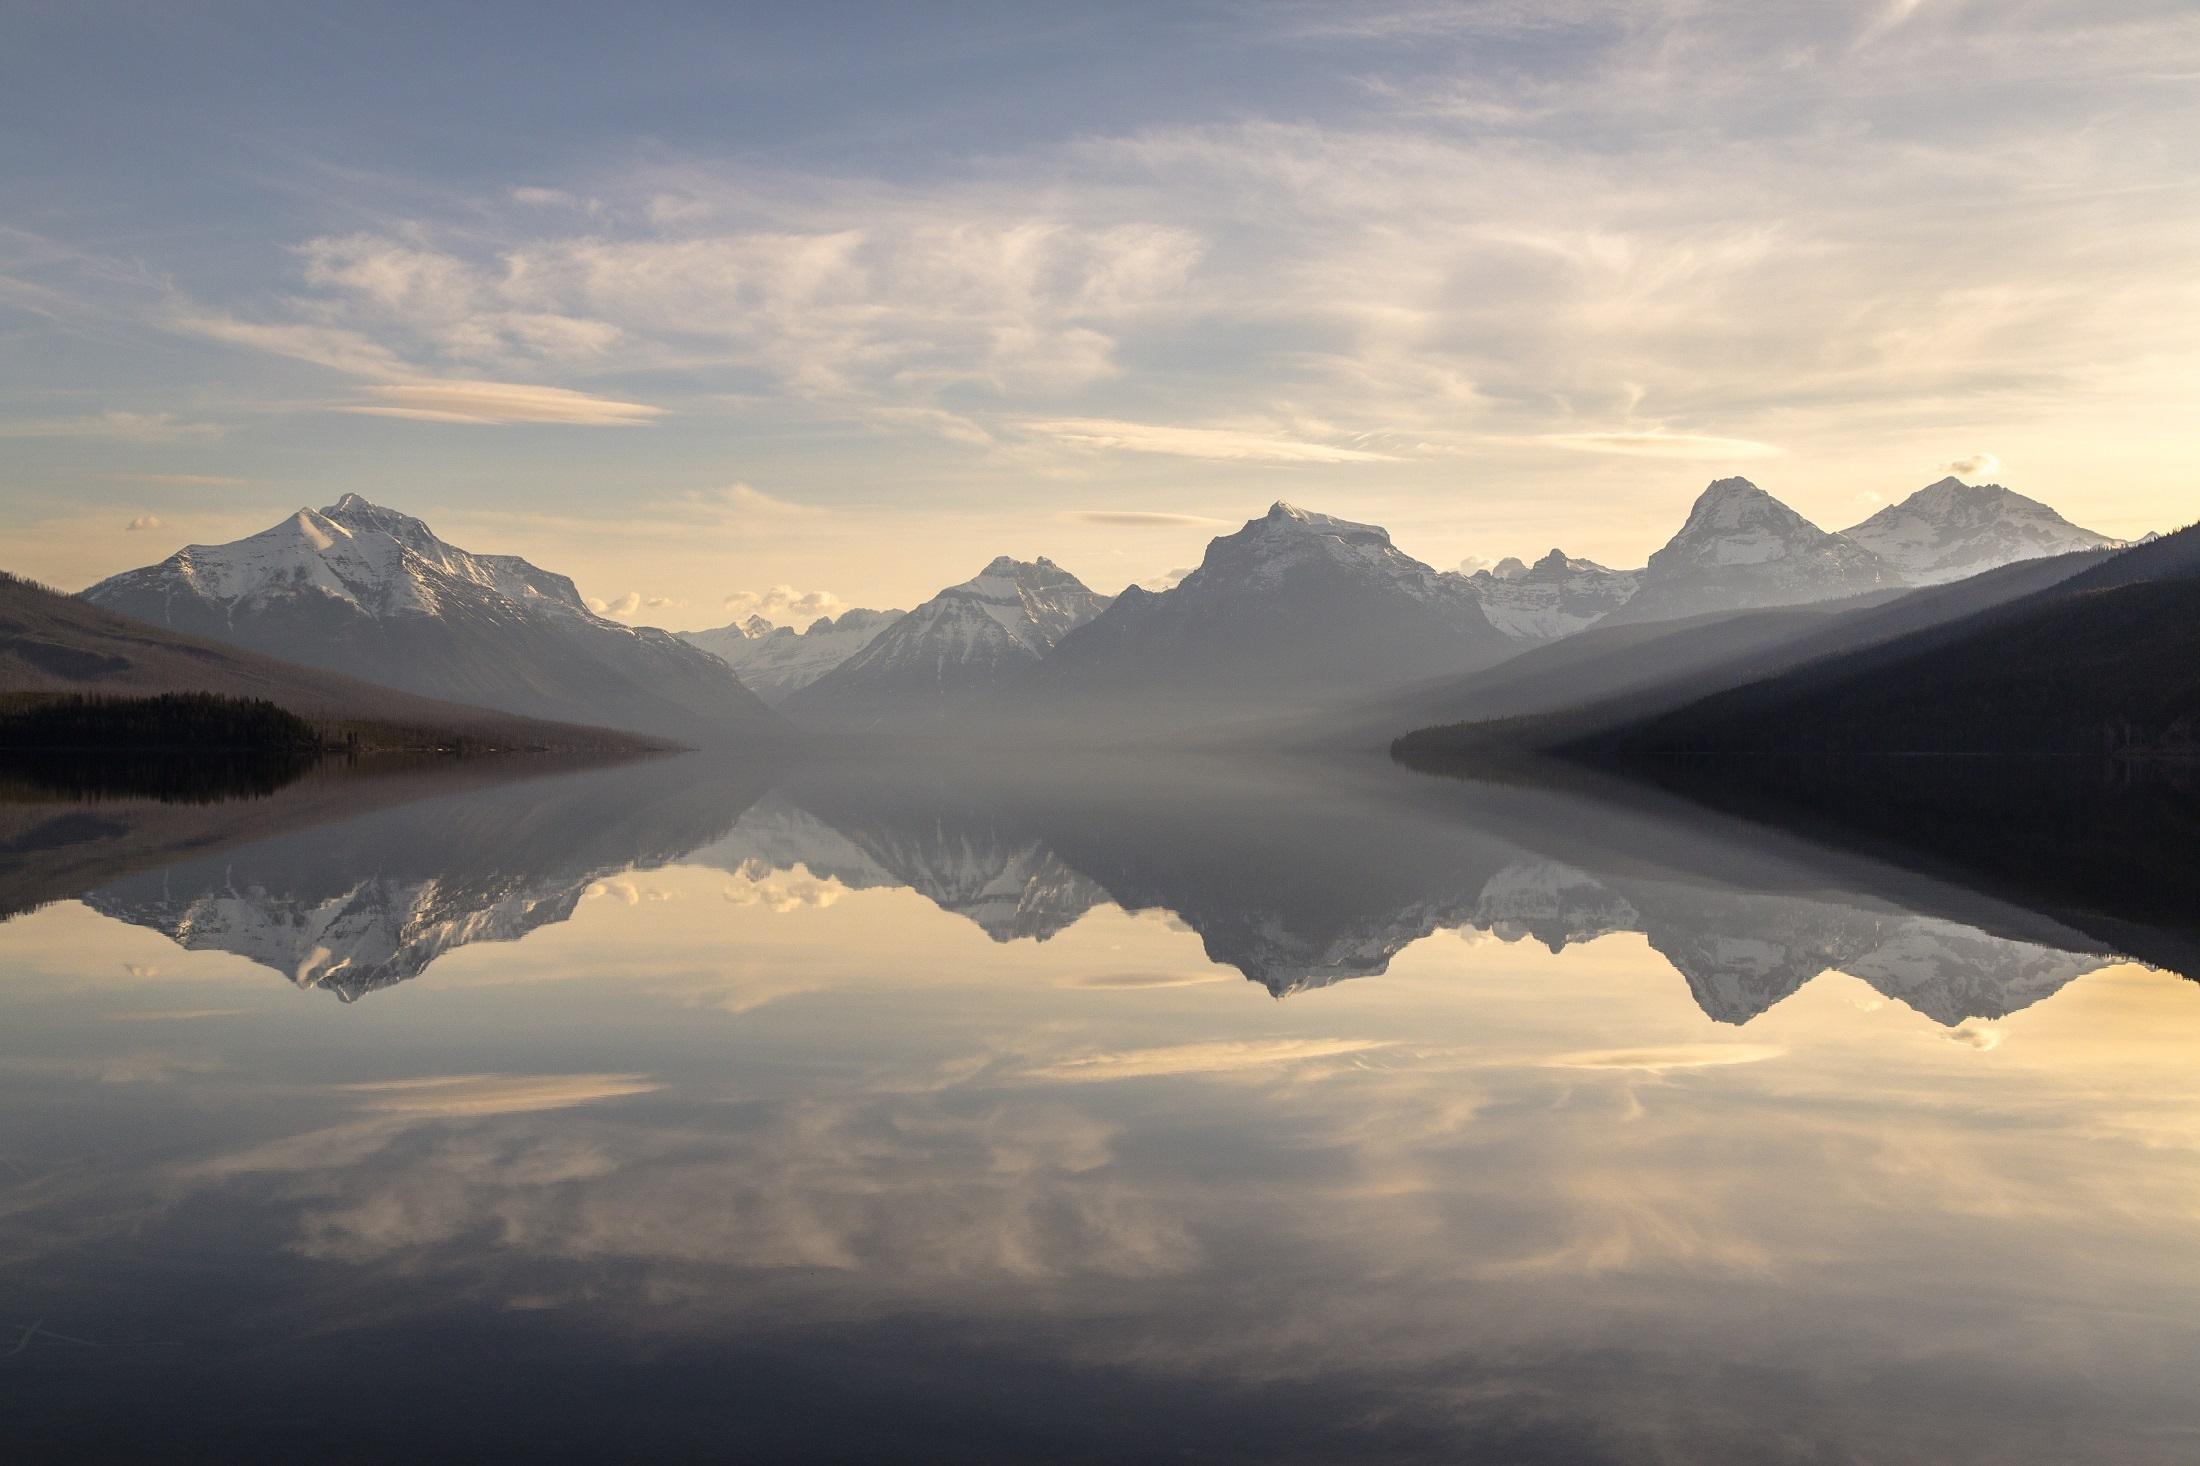 negative-space-reflection-lake-mountains-morning-p_4f77332c923286221d0117c9622db49c